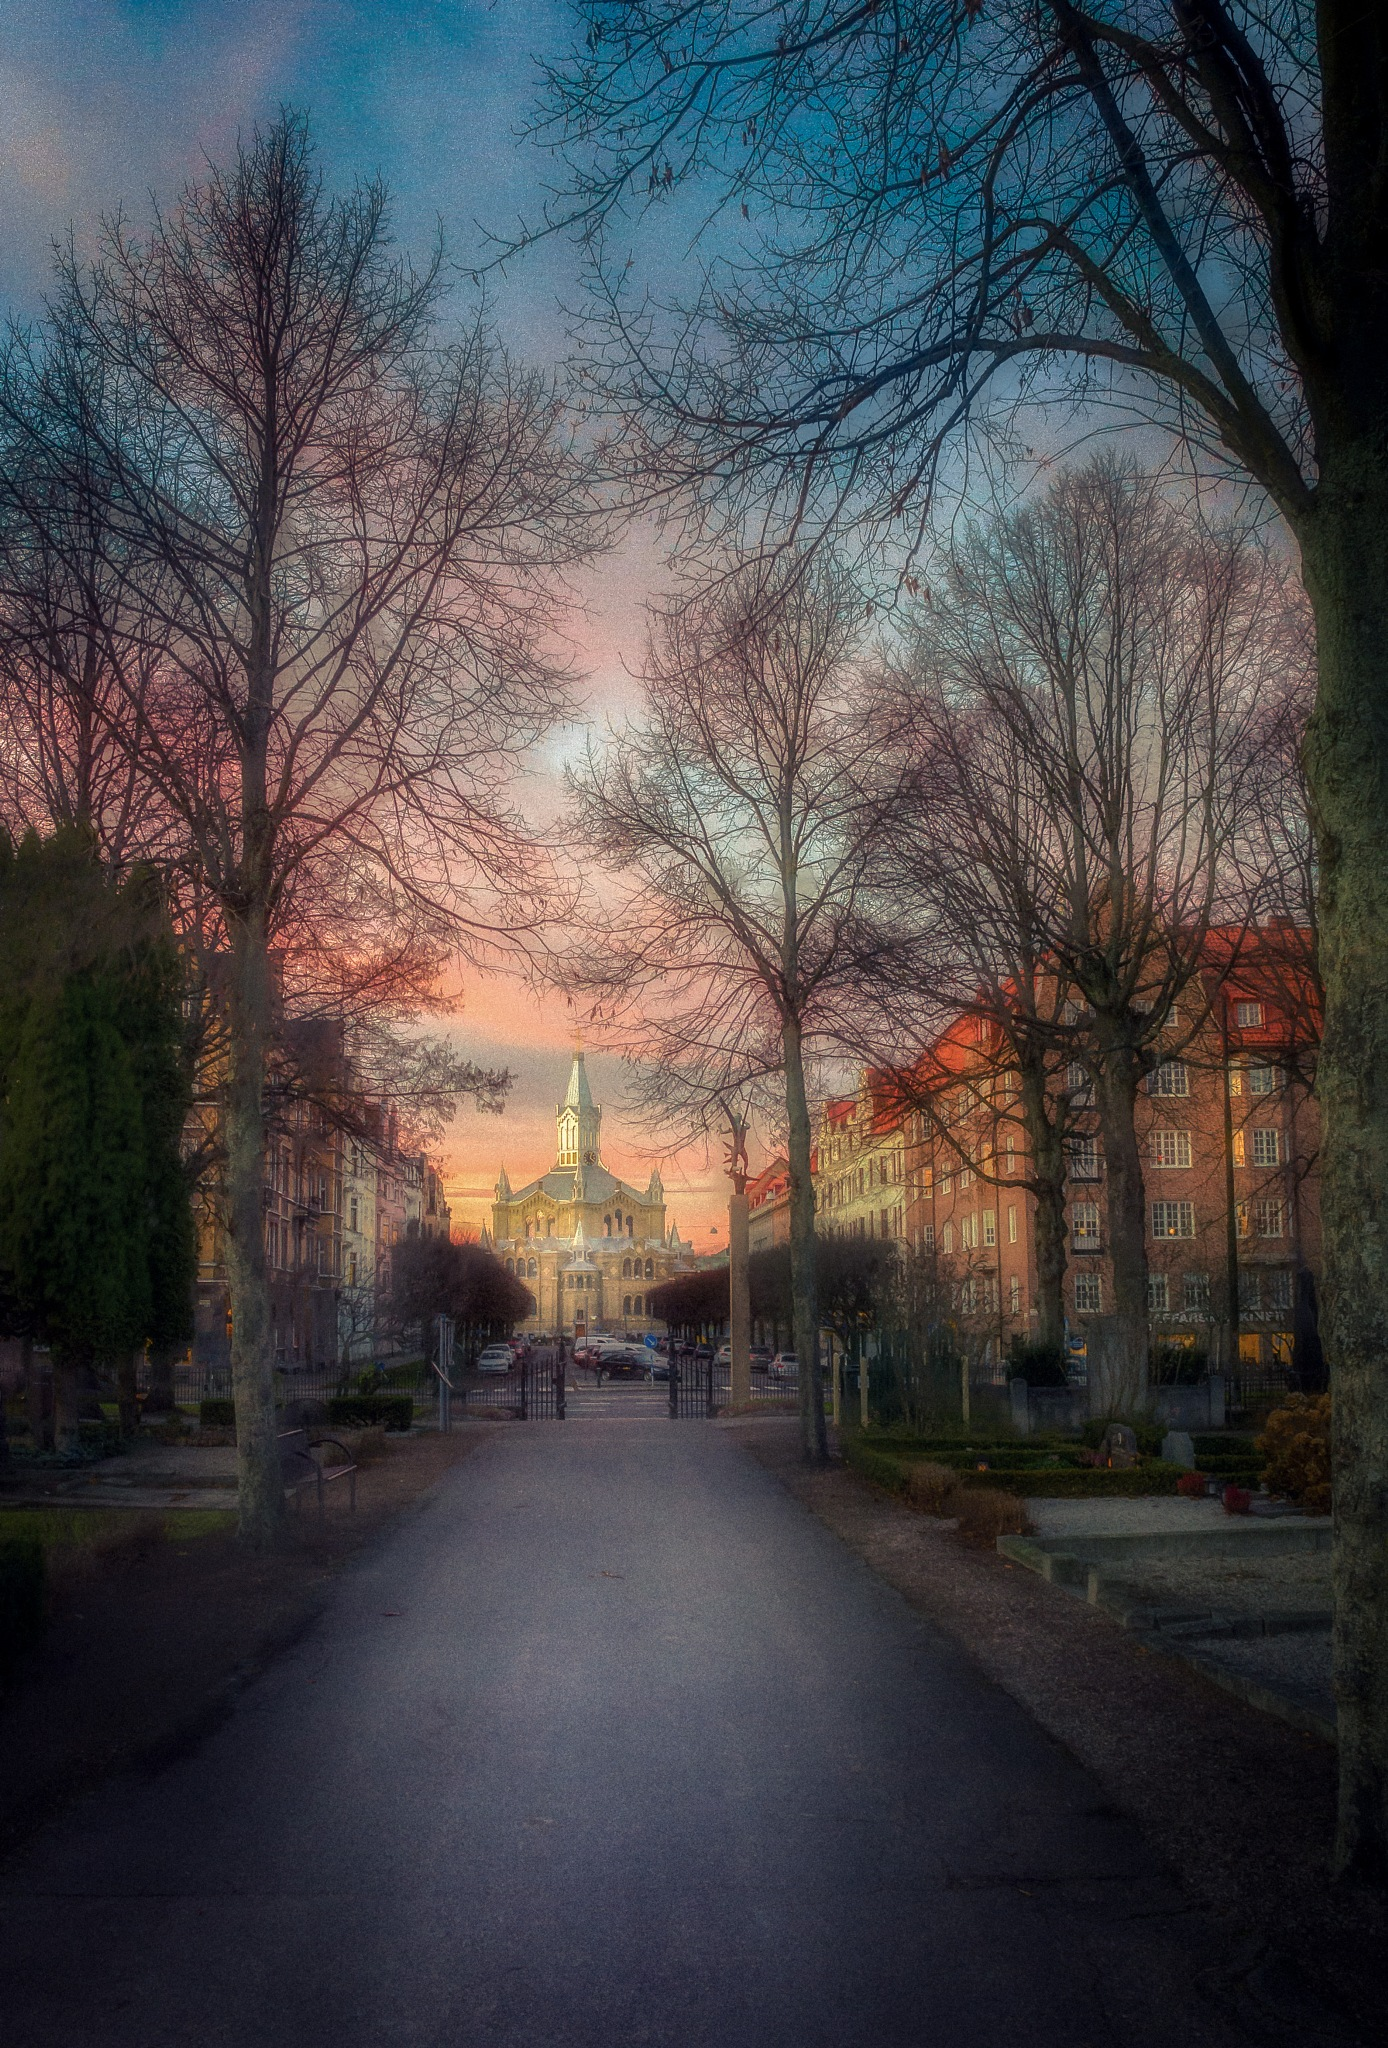 Cemetery road by Mirza Buljusmic